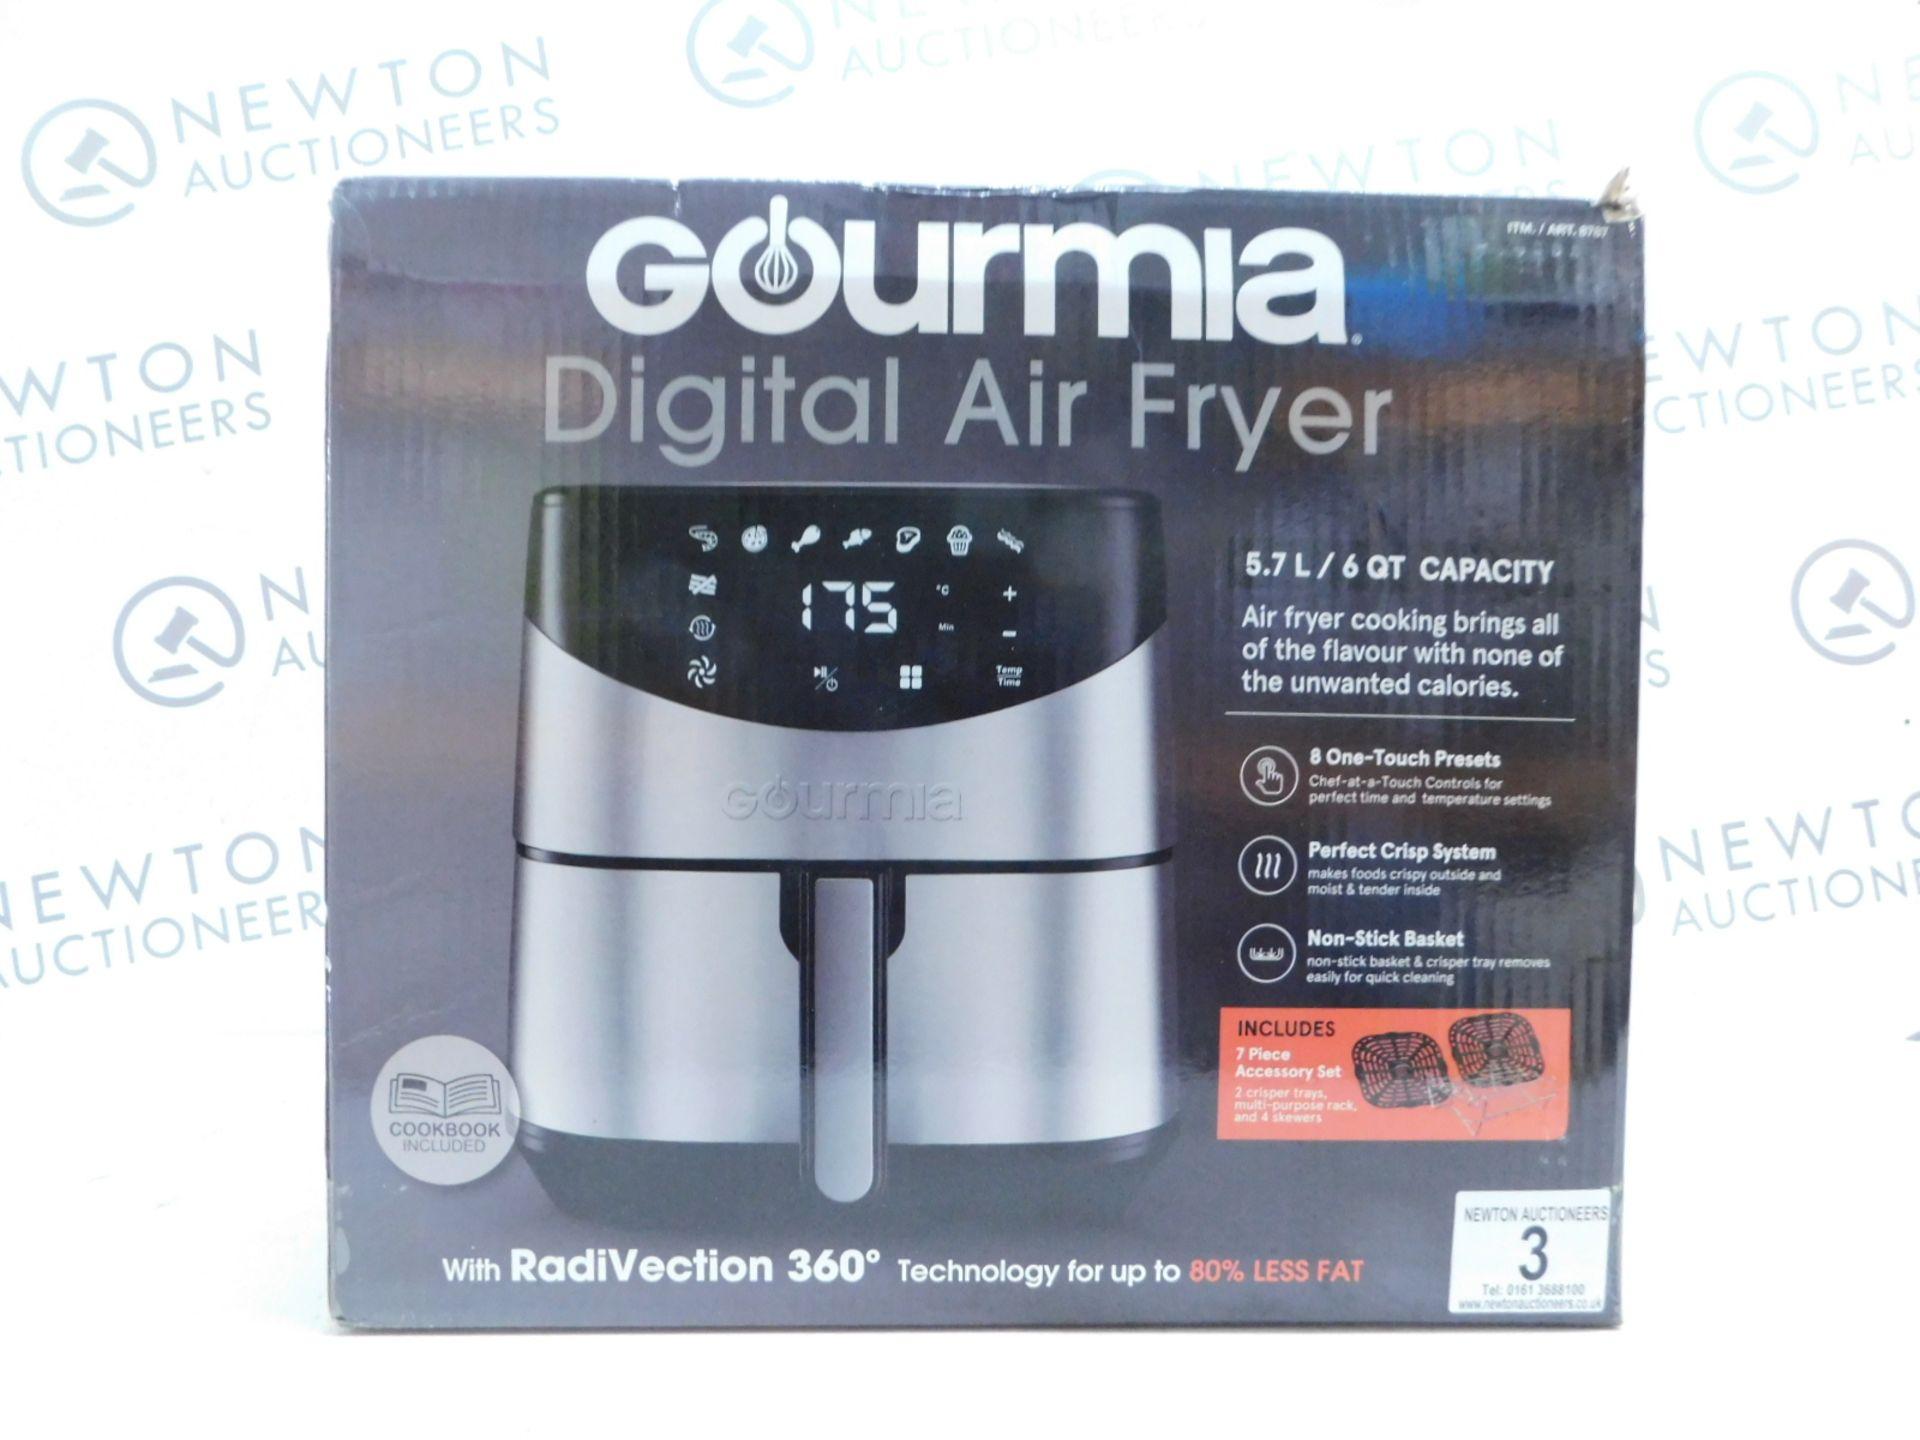 Lot 3 - 1 BOXED GOURMIA 5.7L DIGITAL AIR FRYER RRP £89.99